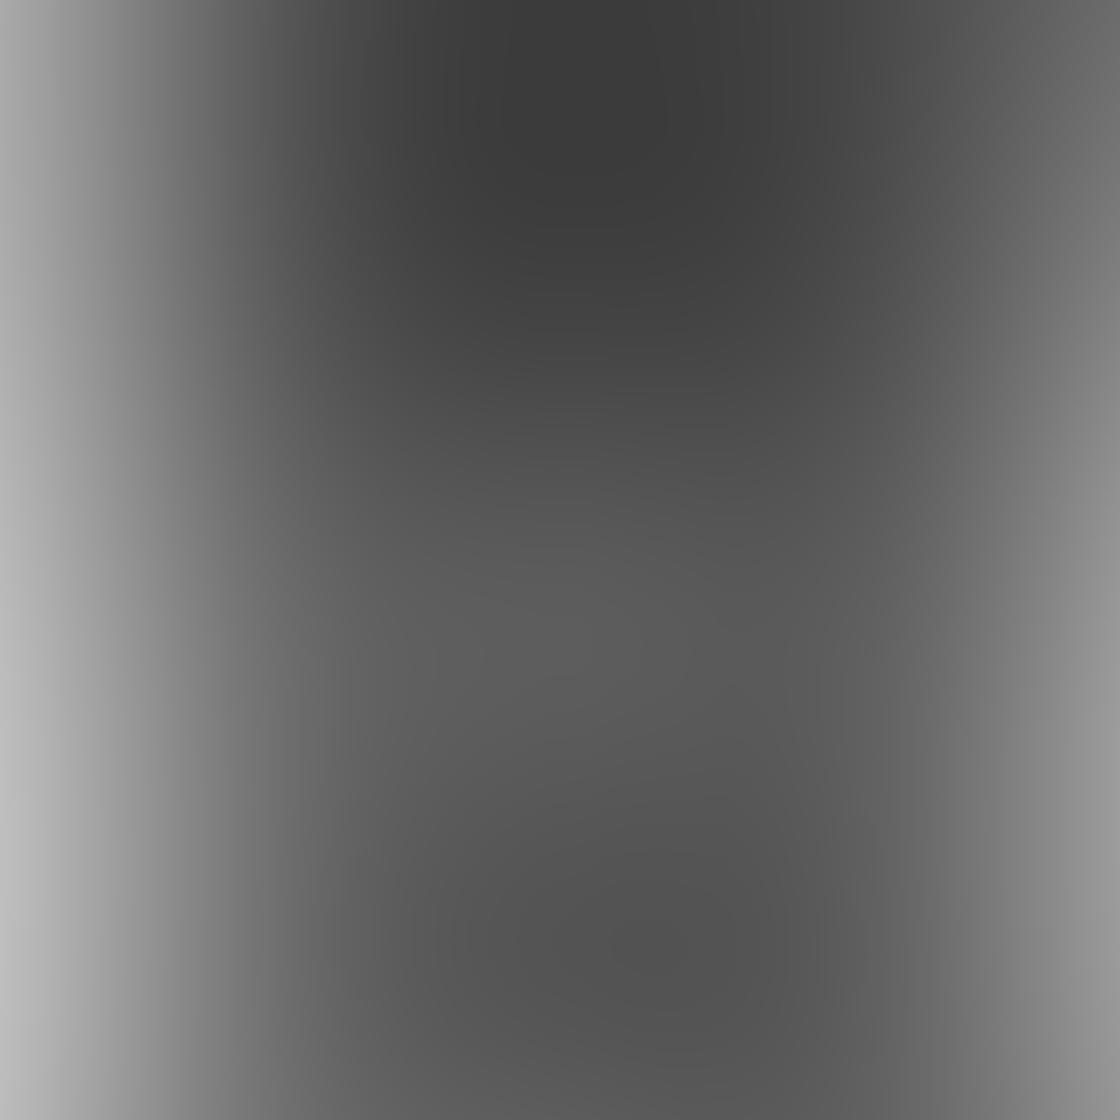 iPhone Photos Black White 5